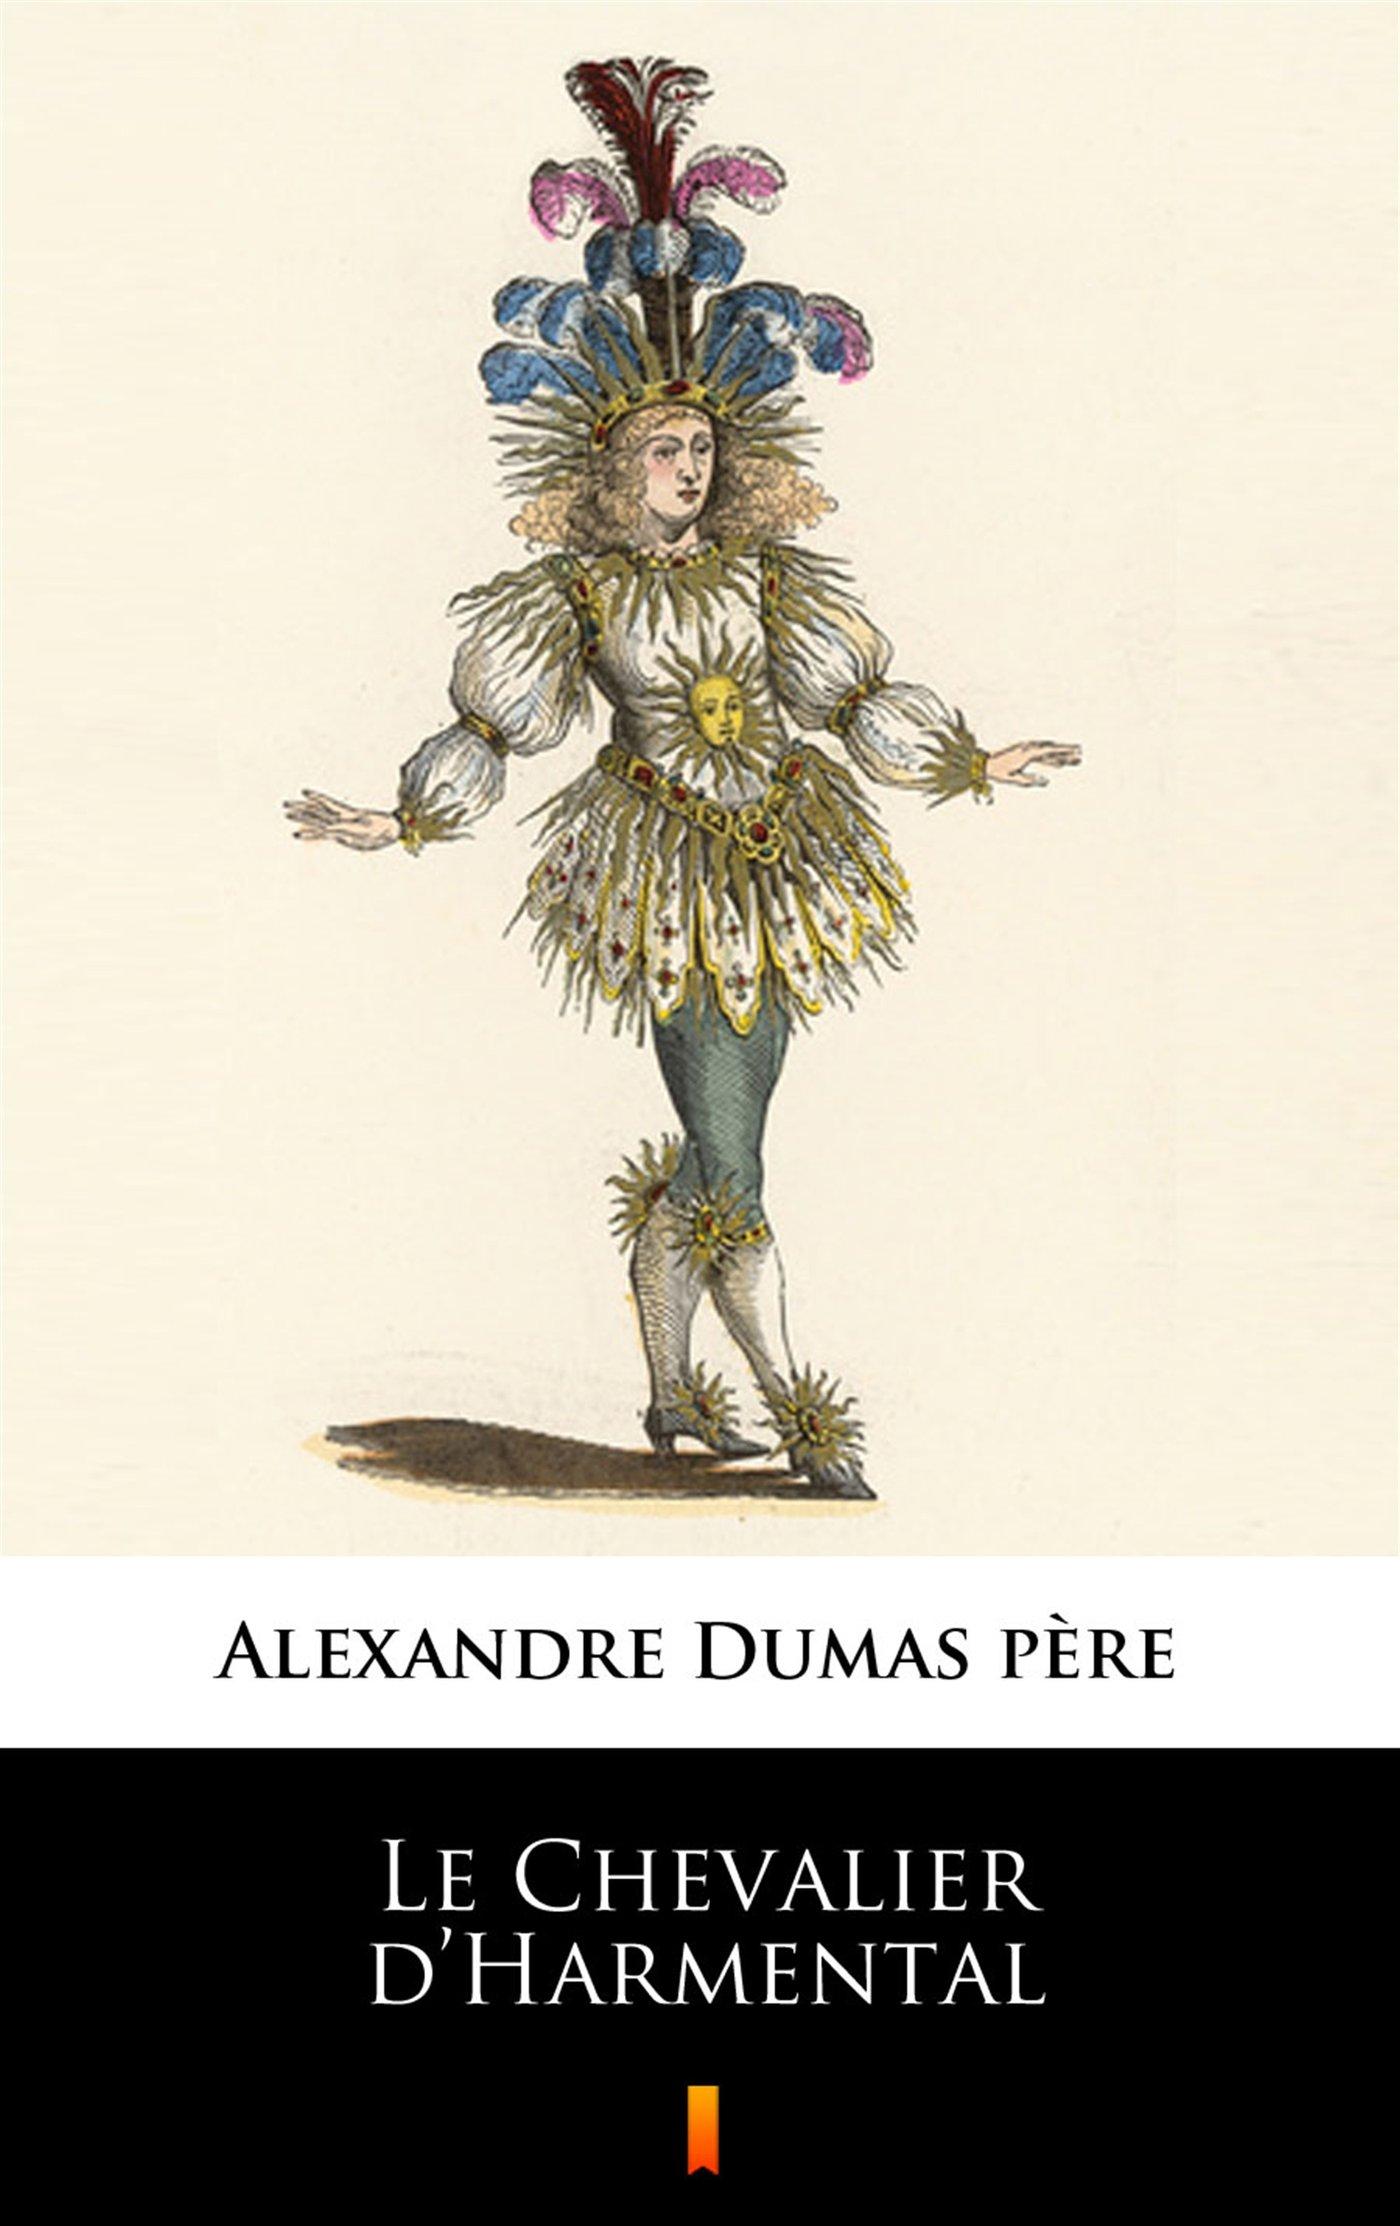 Le Chevalier d'Harmental - Ebook (Książka na Kindle) do pobrania w formacie MOBI